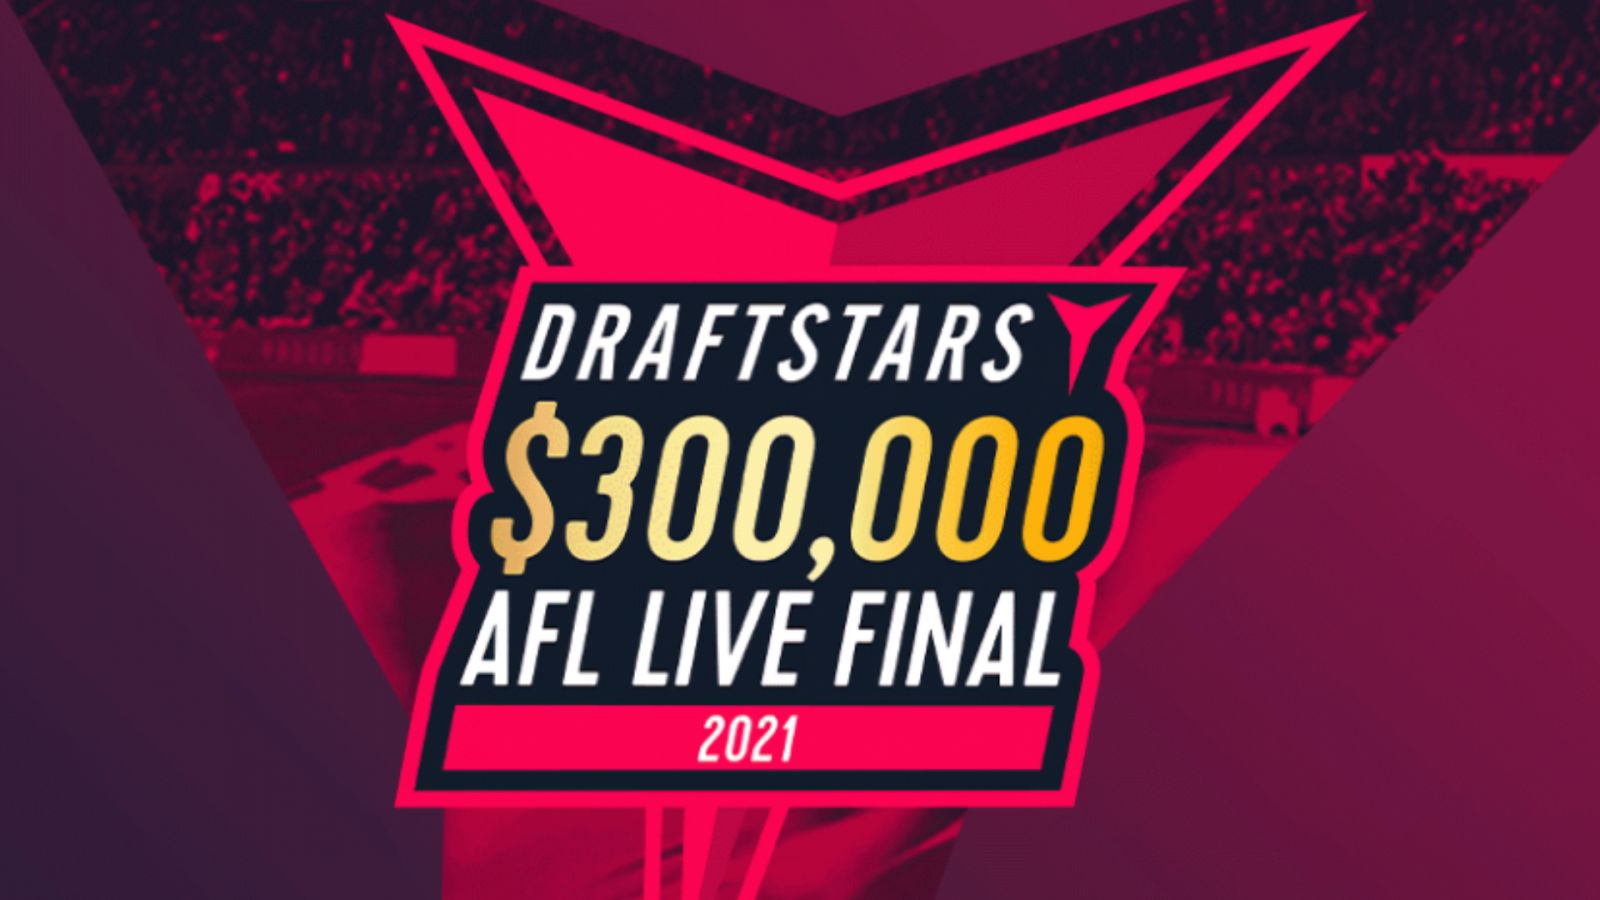 Draftstars Announce 2021 $300,000 Live Final